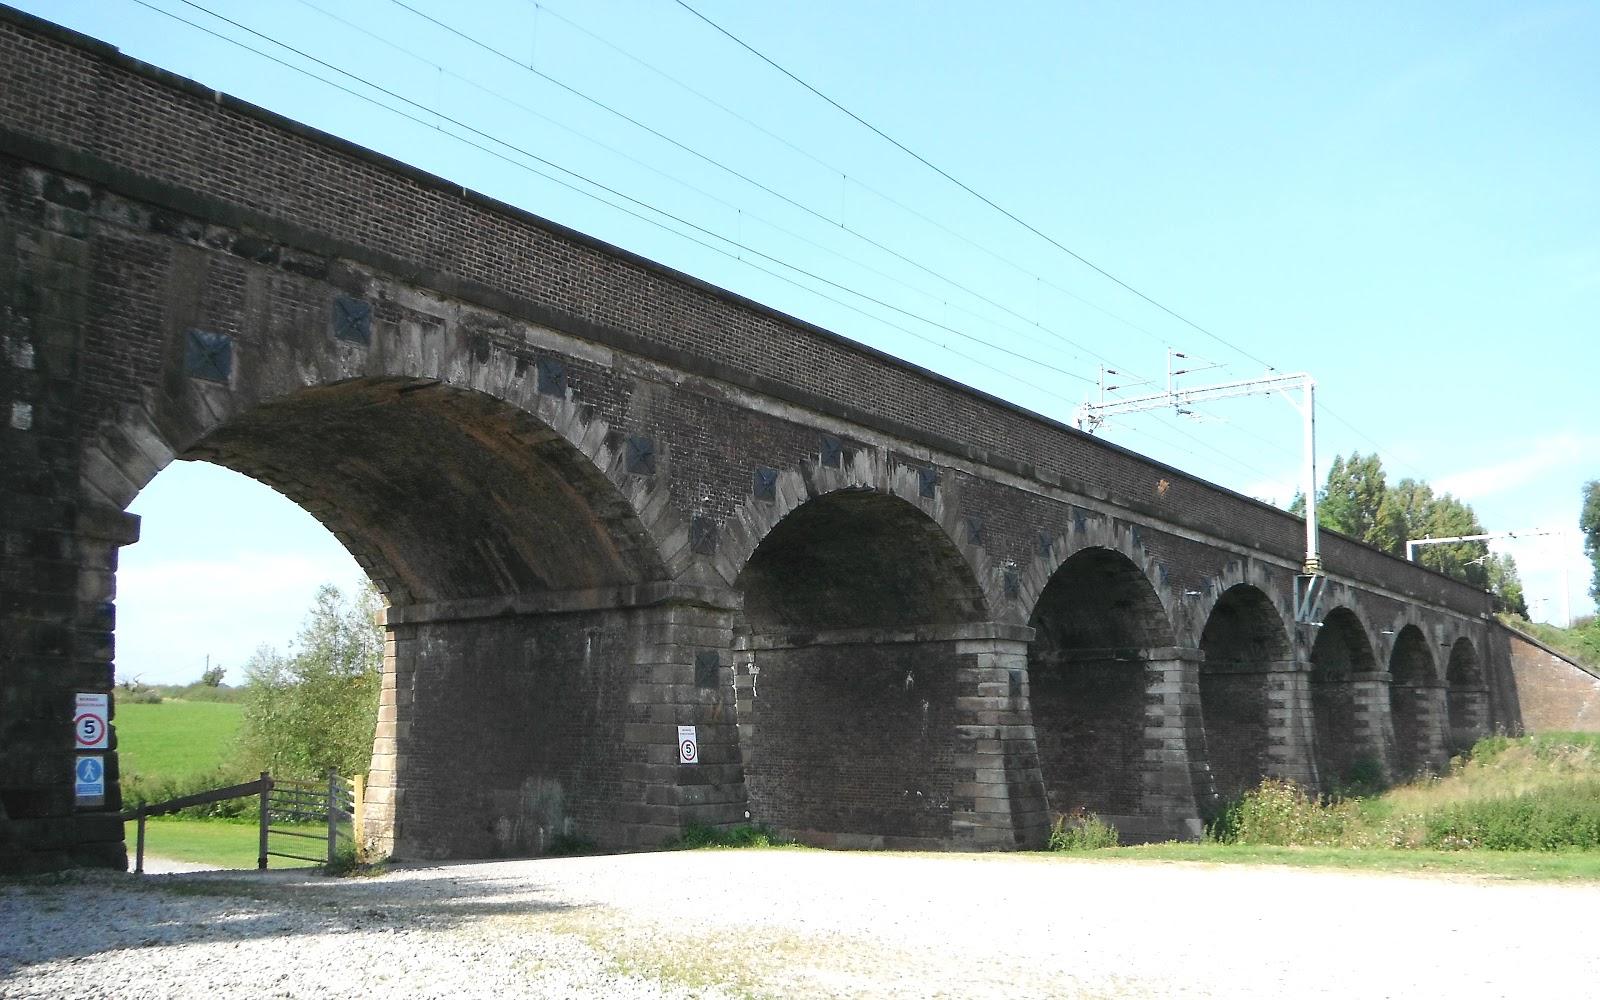 Penkridge Railway Viaduct